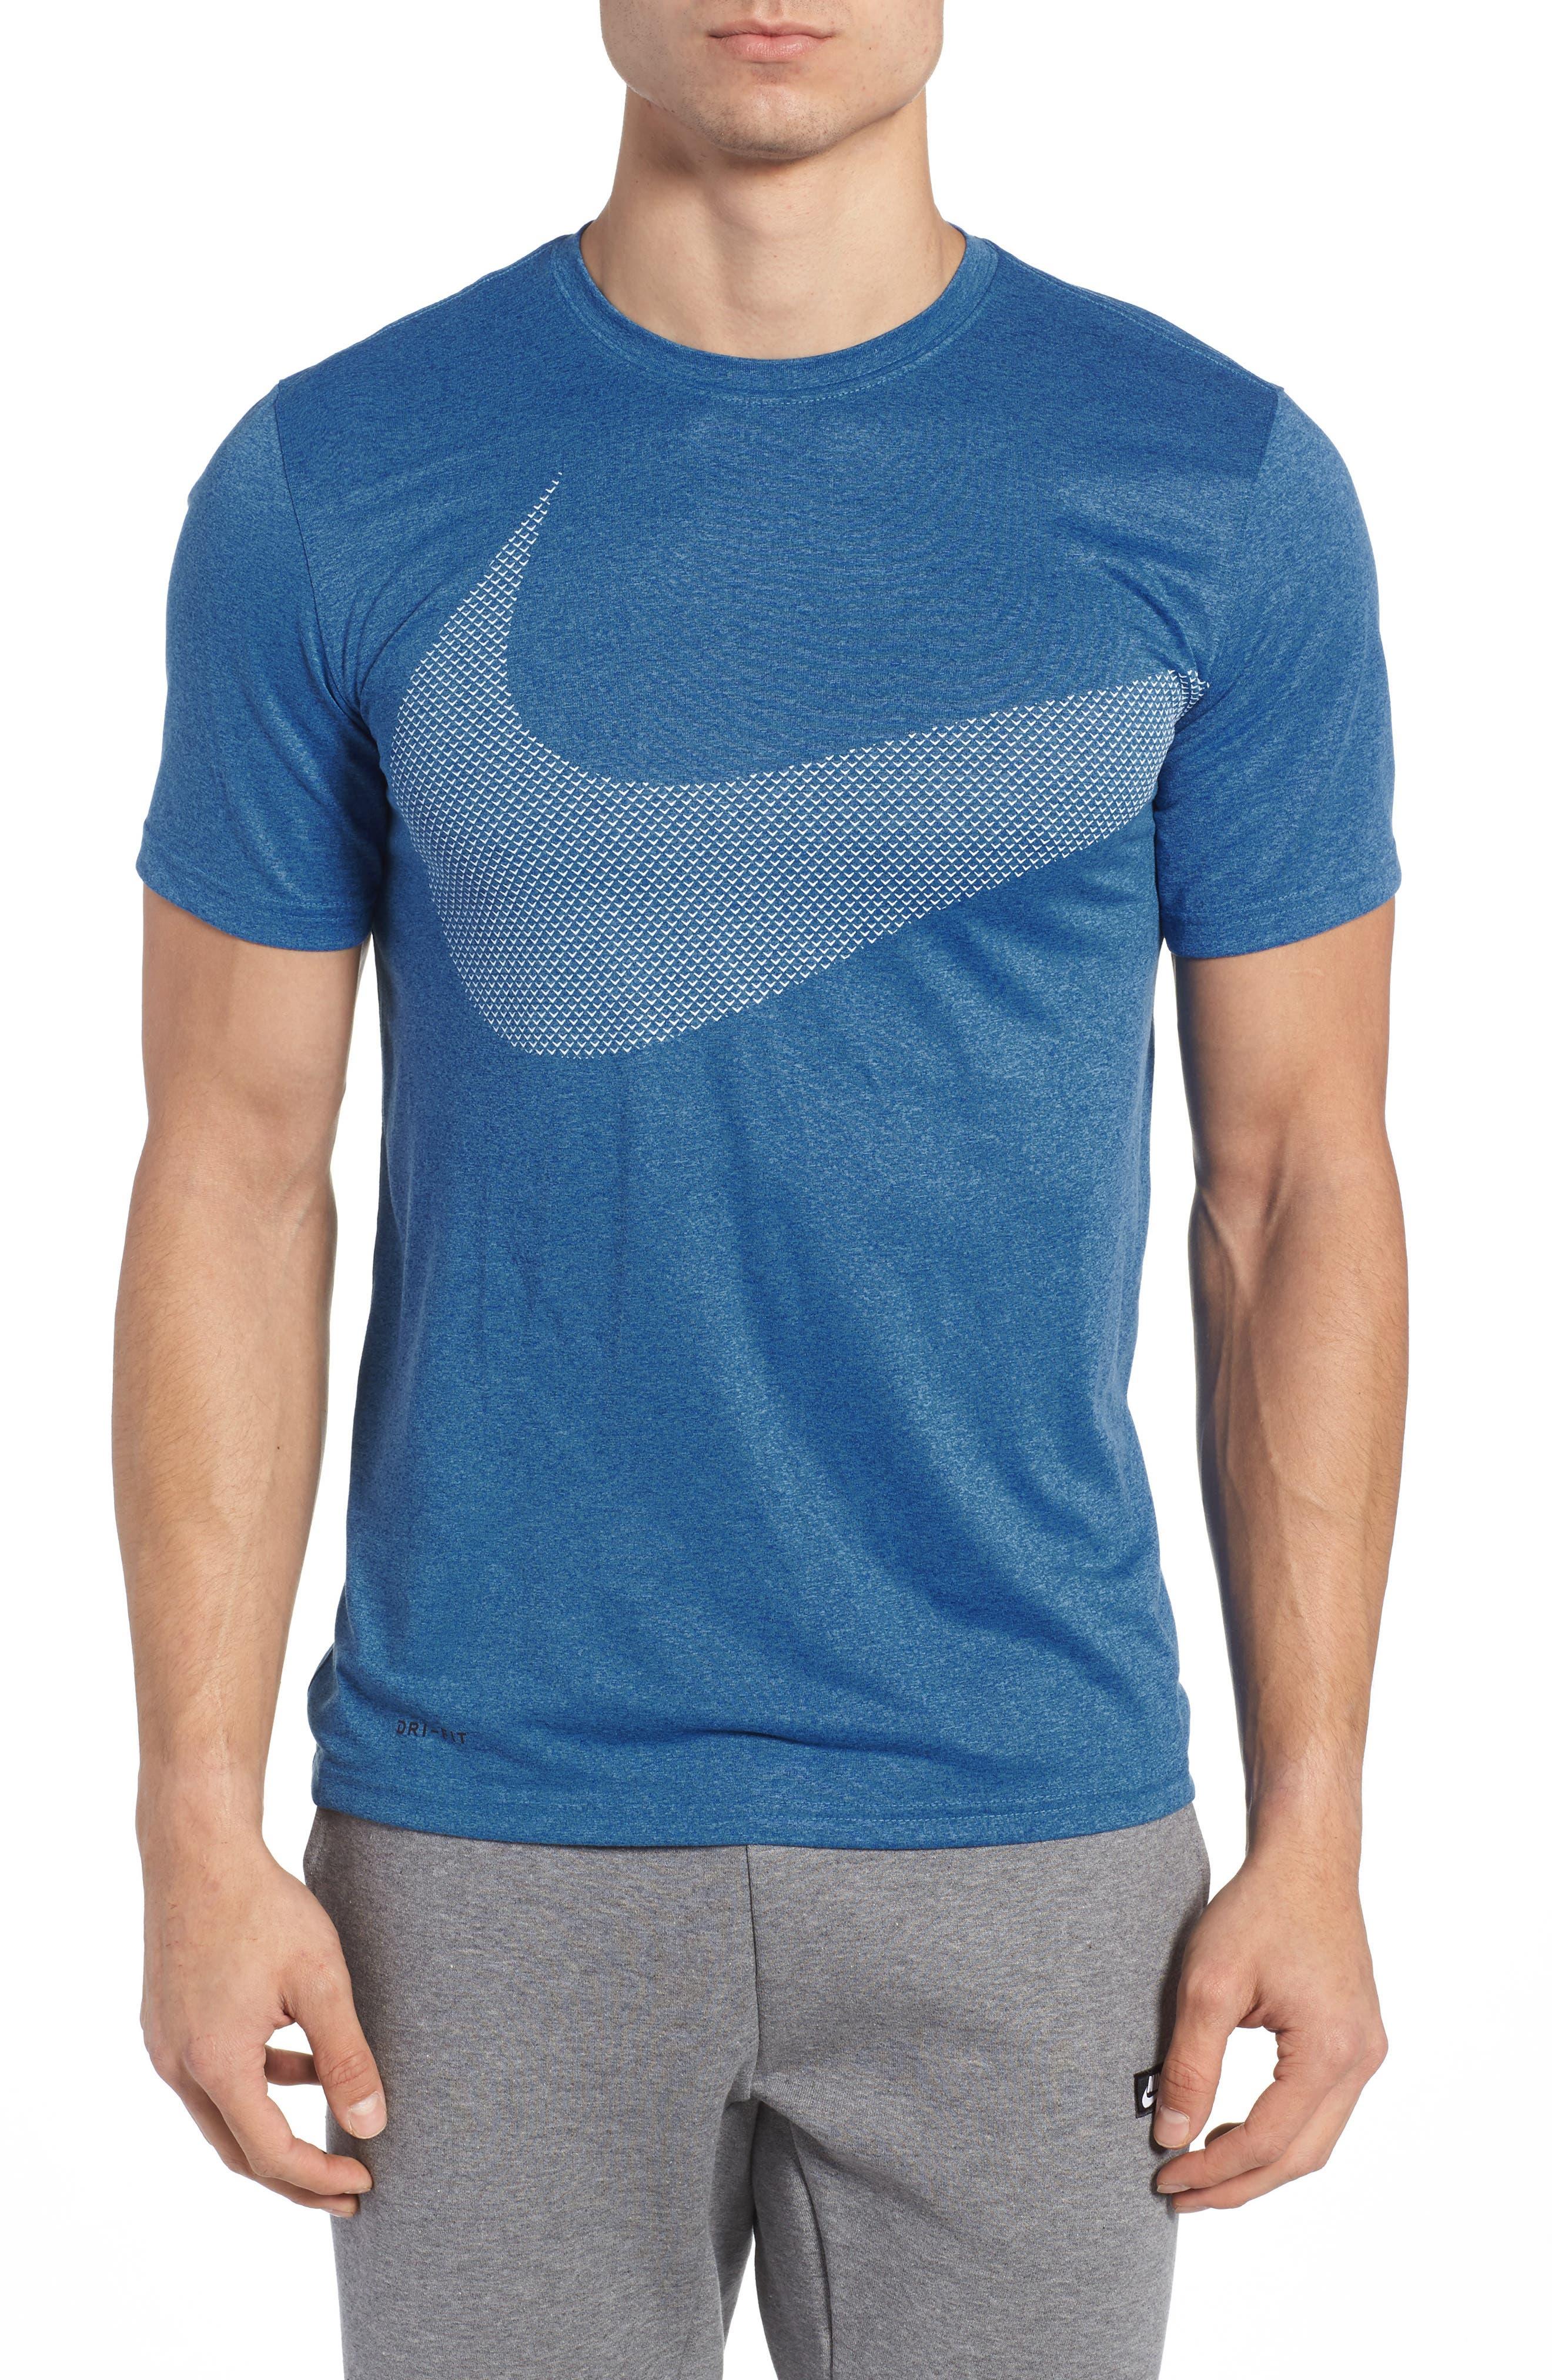 Nike Dry Swoosh Logo Training T-Shirt